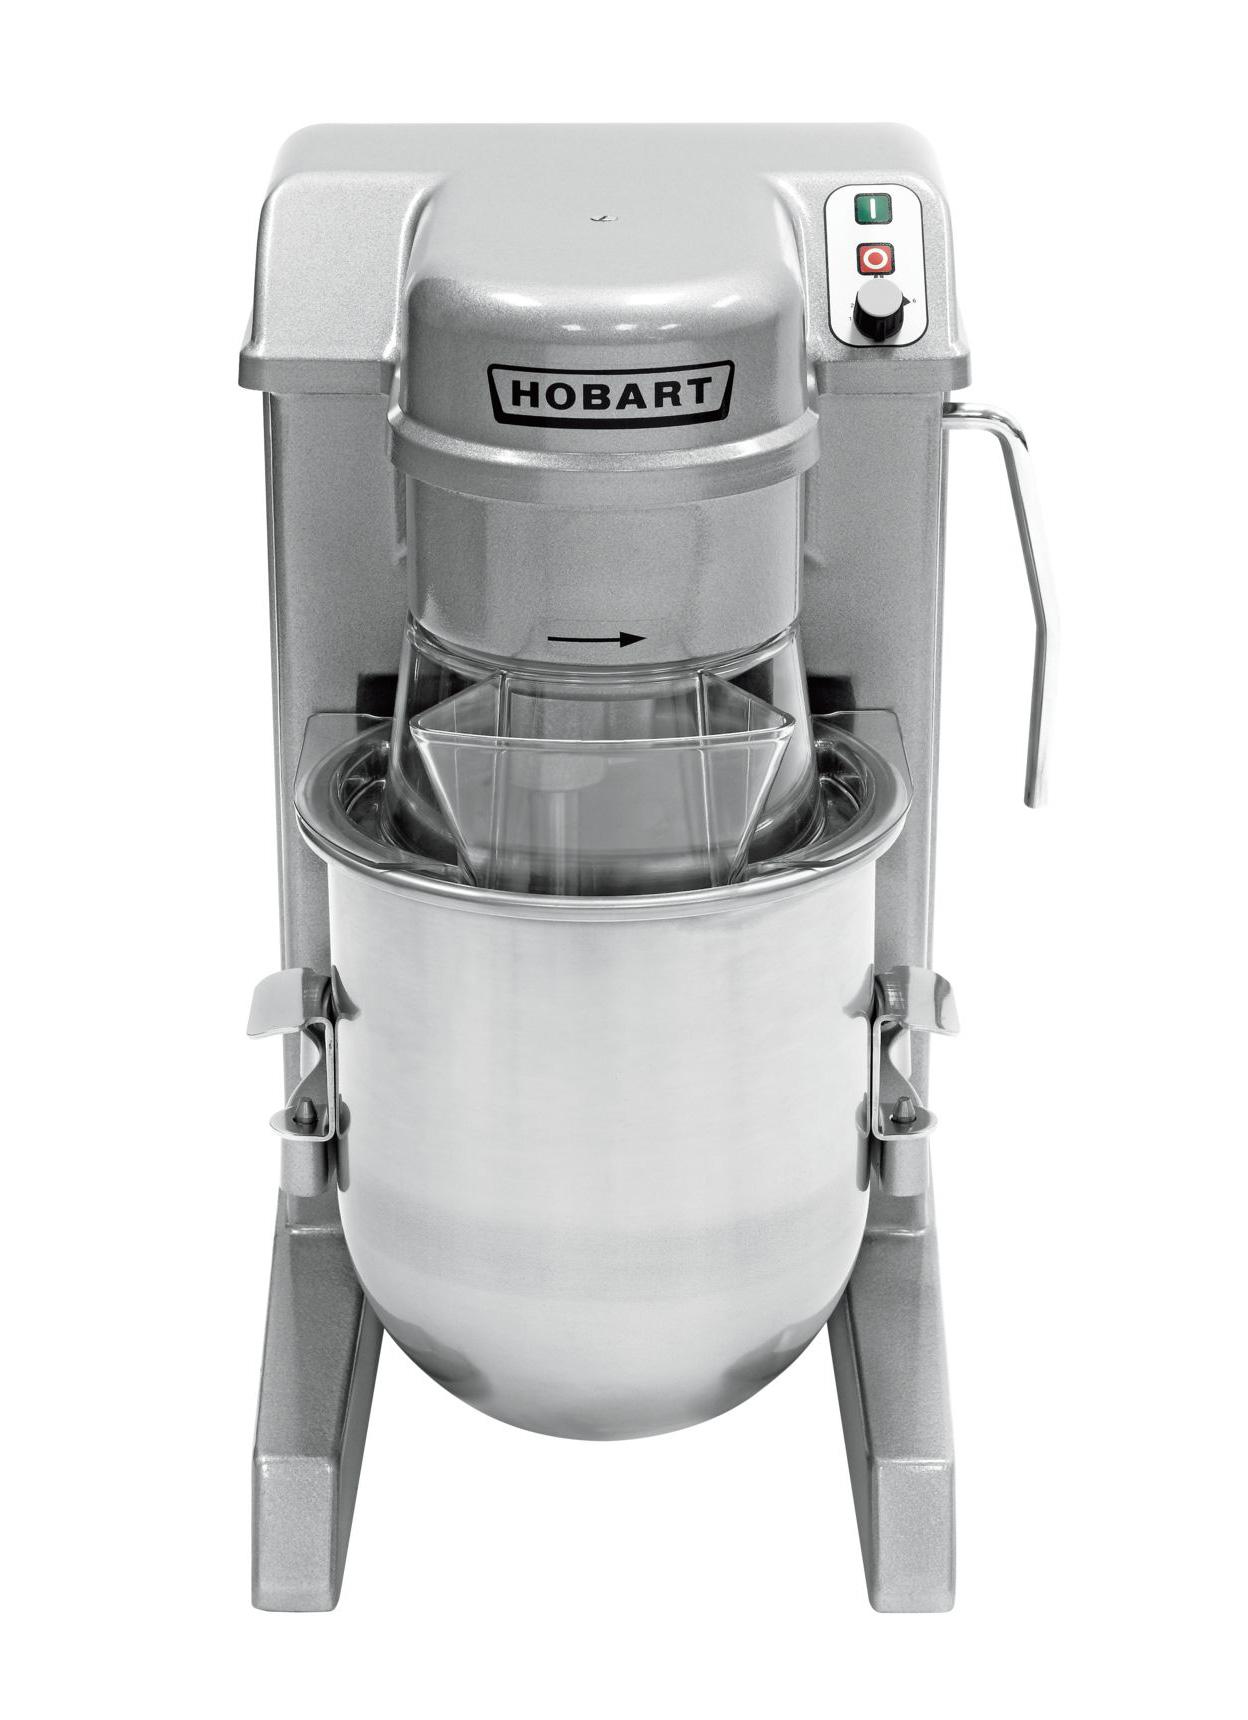 Hobart Planetenrührmaschine HSM10